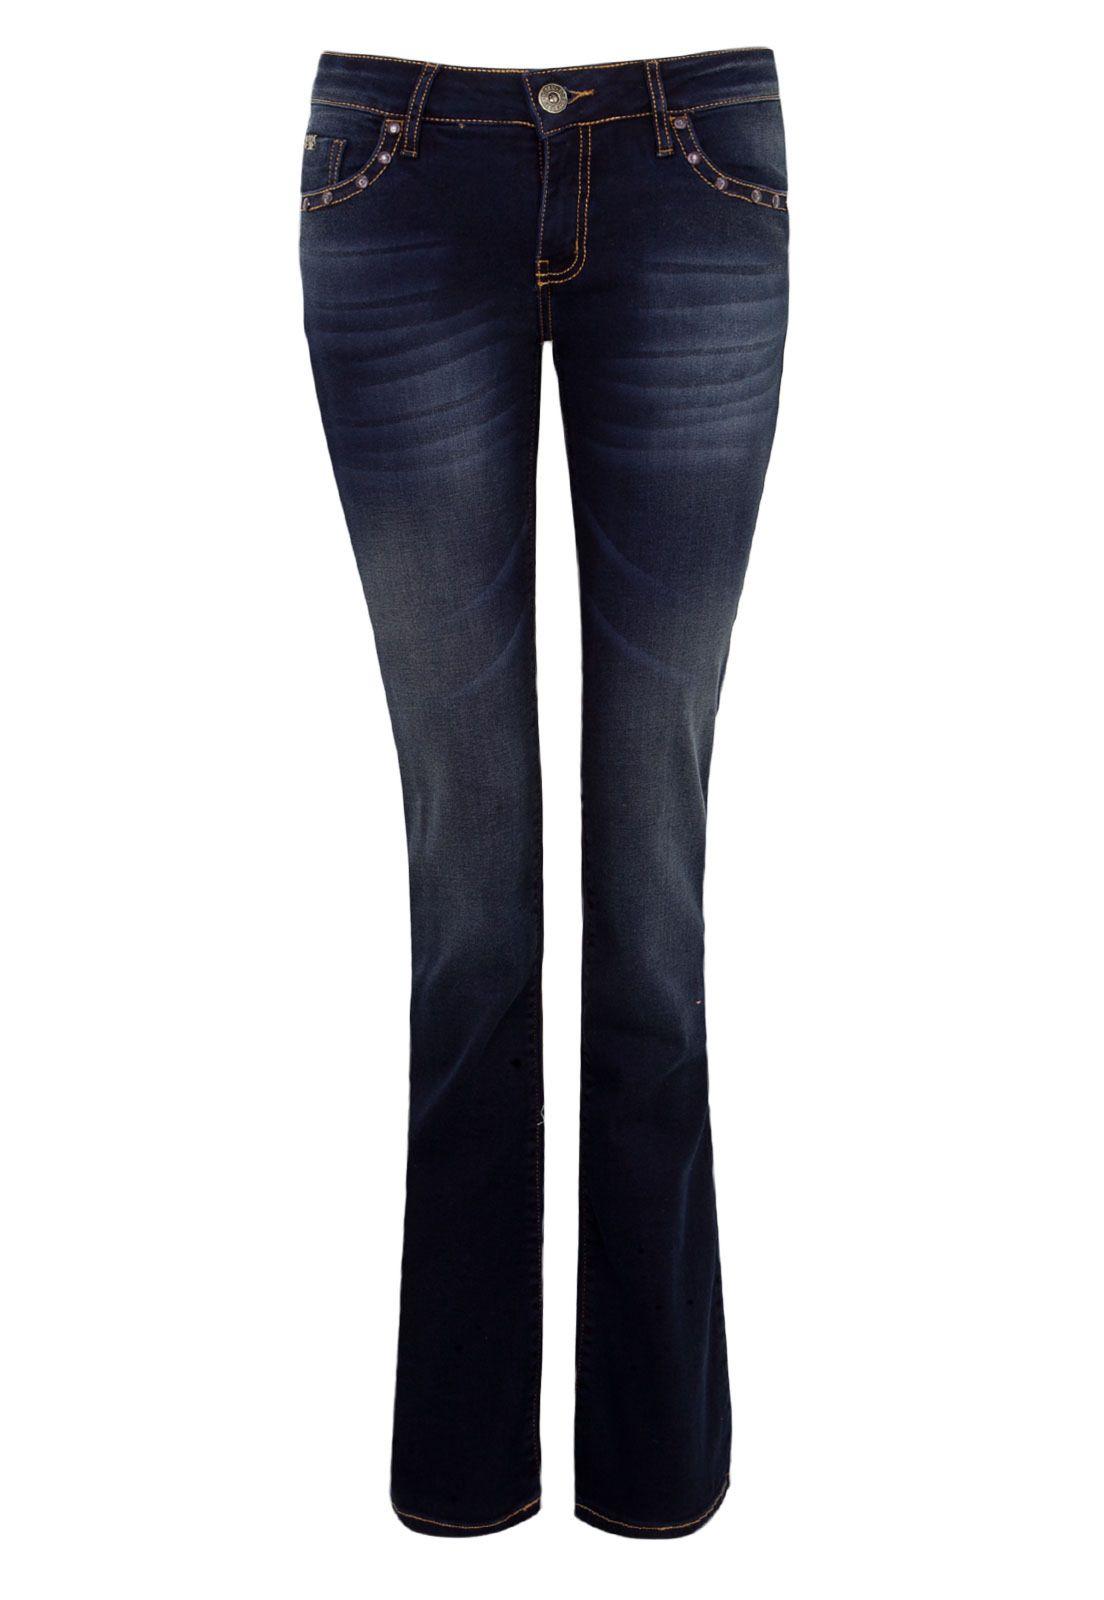 Calça Jeans Forum Bootcut Raquel Tachas Azul - Compre Agora | Dafiti Brasil